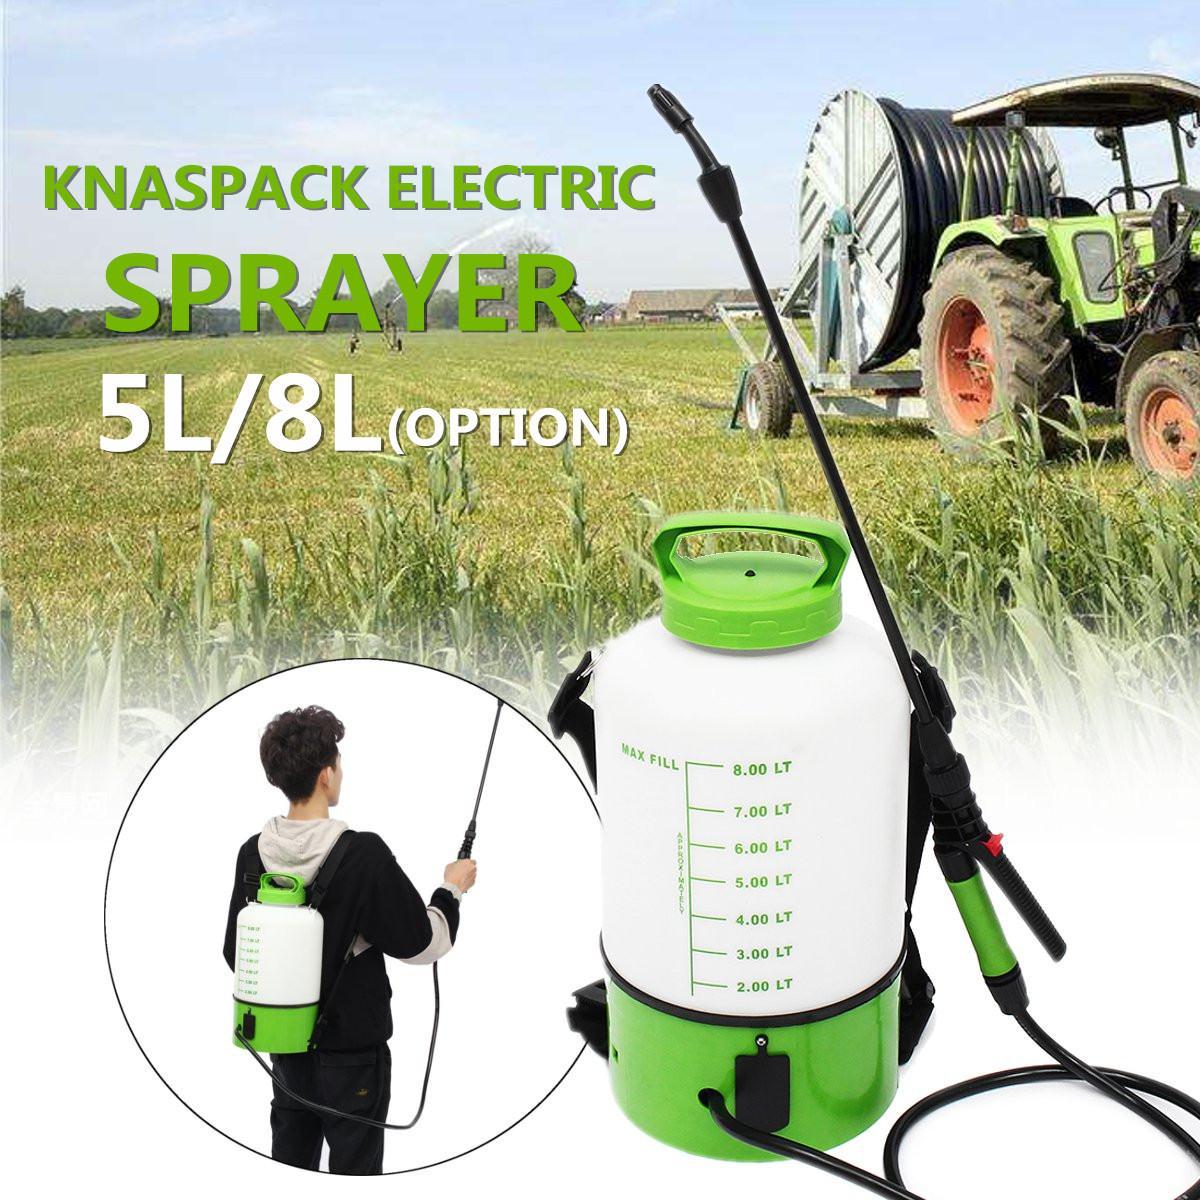 Garden Pressure Sprayer Knapsack Chemical Weed Killer Fence Watering Tools